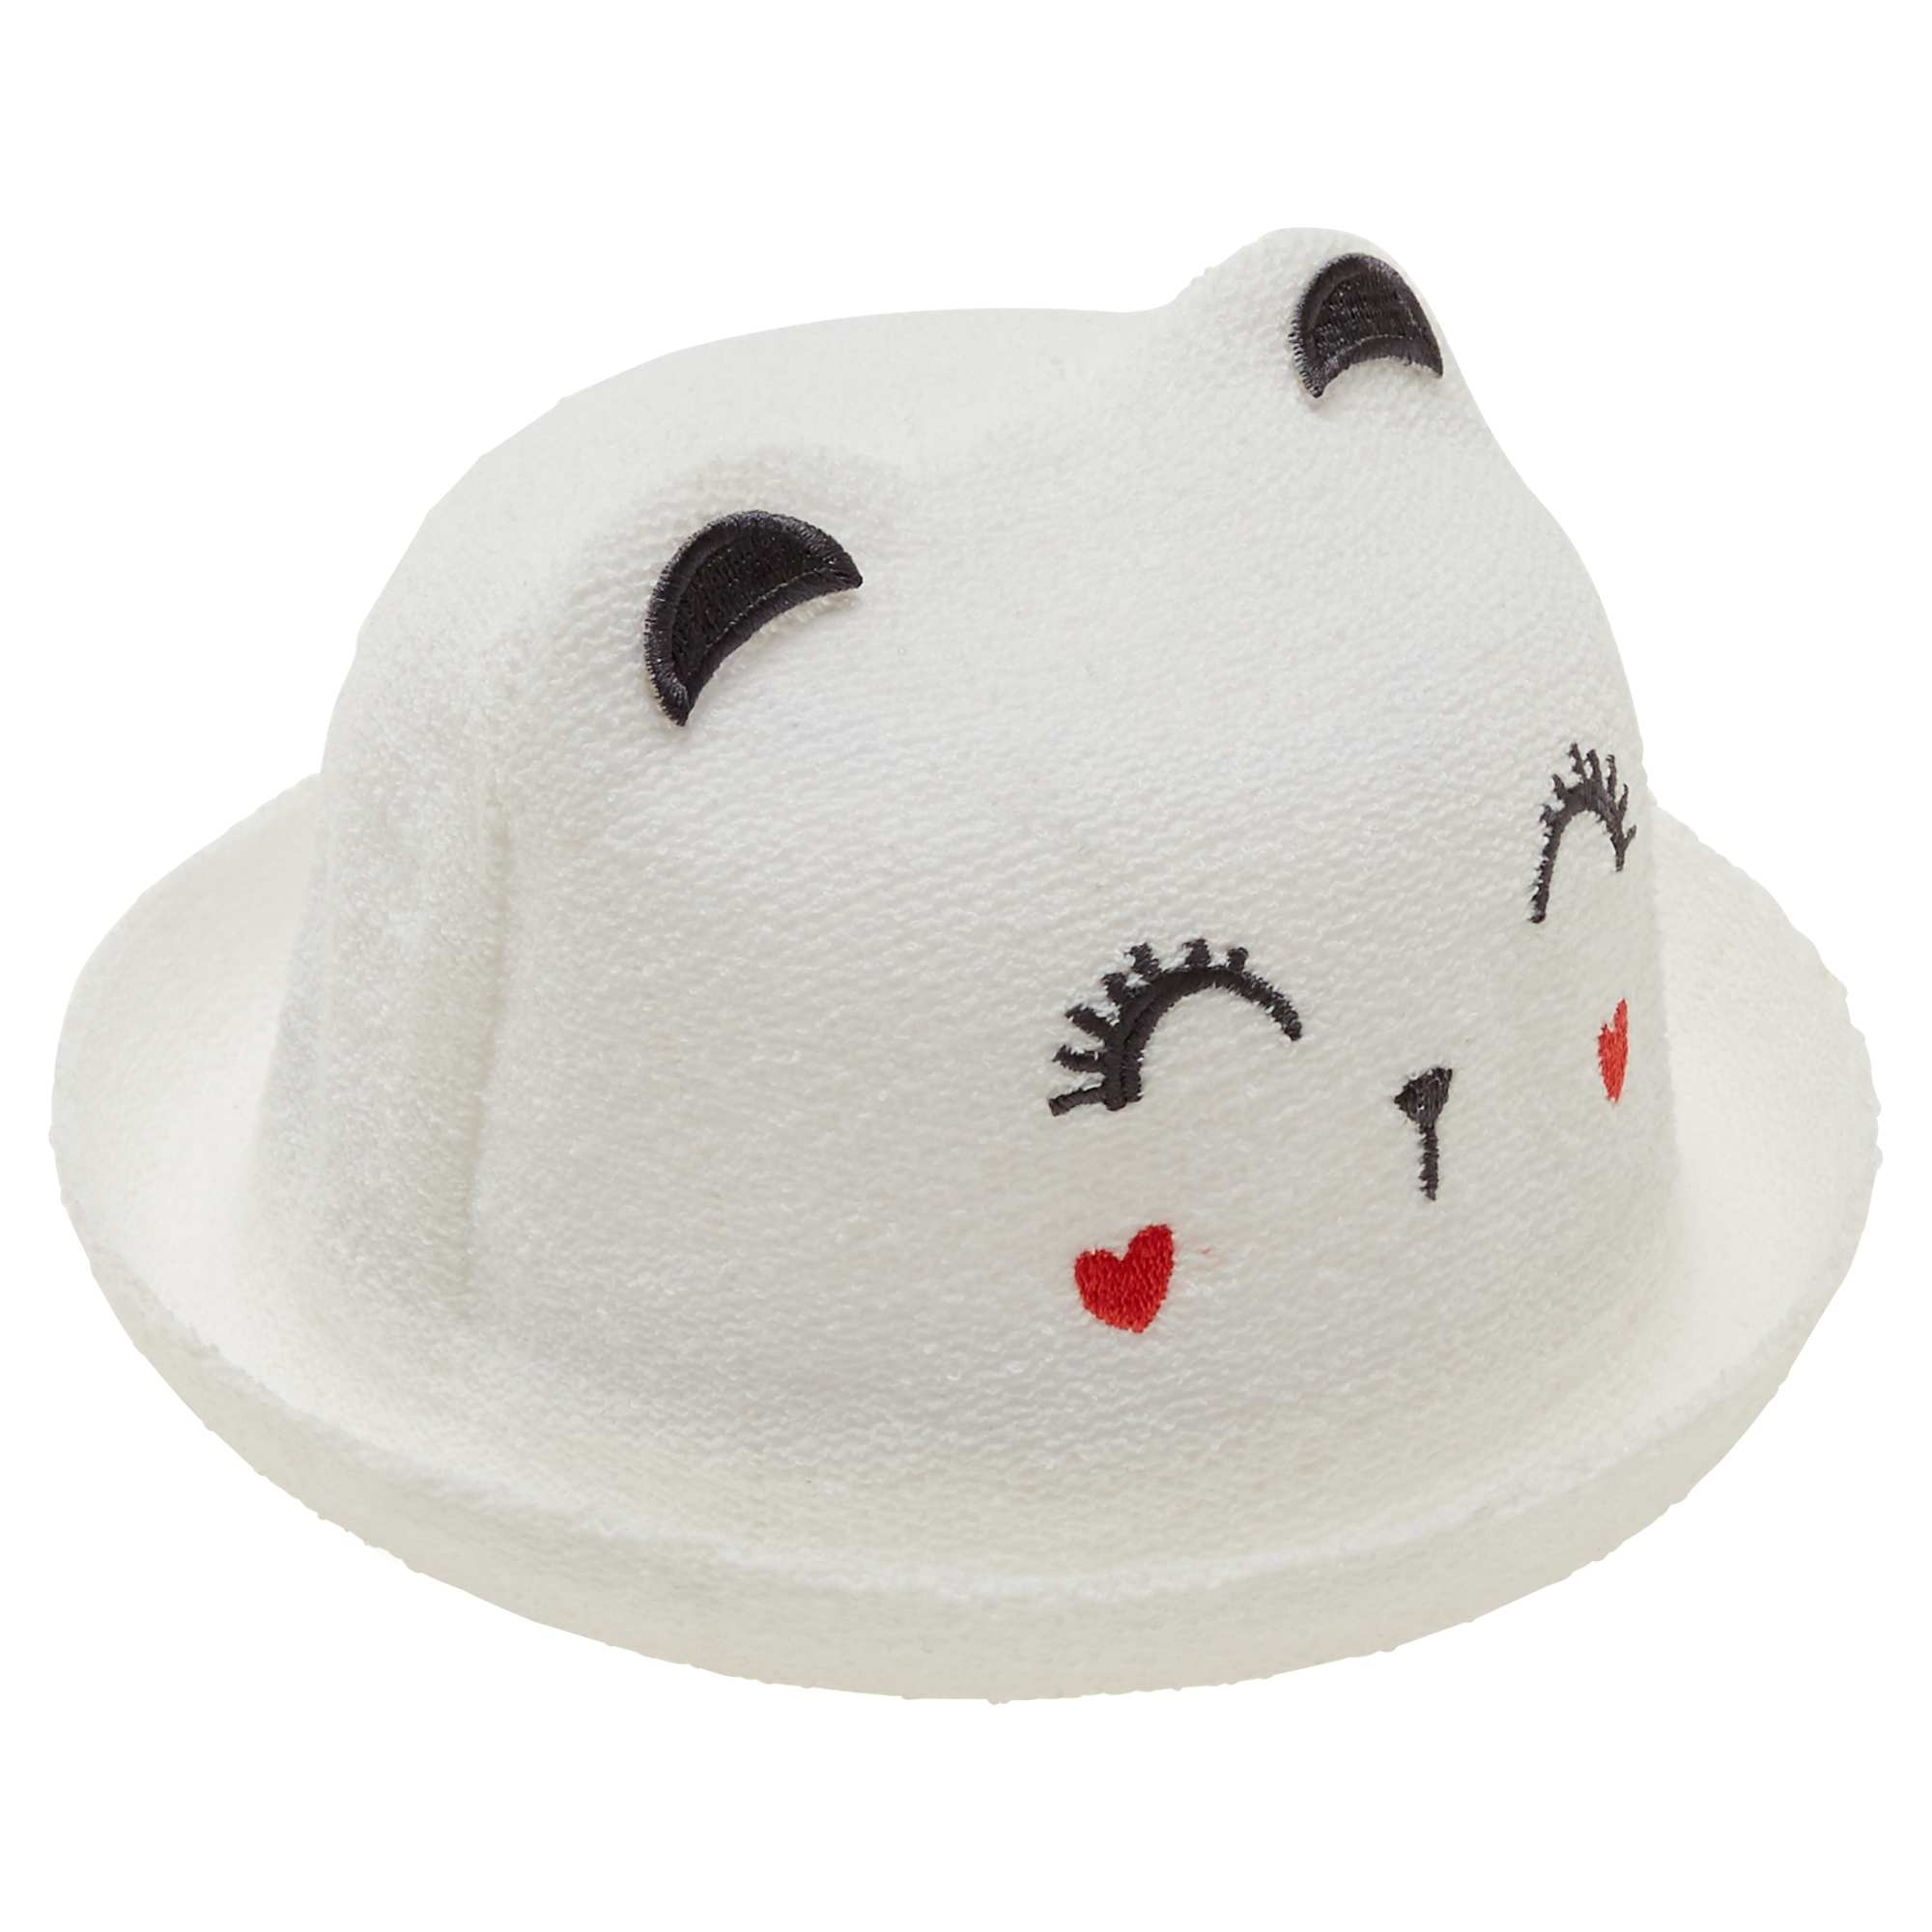 chapeau fa on bouclette 39 chat 39 b b fille kiabi 7 00. Black Bedroom Furniture Sets. Home Design Ideas